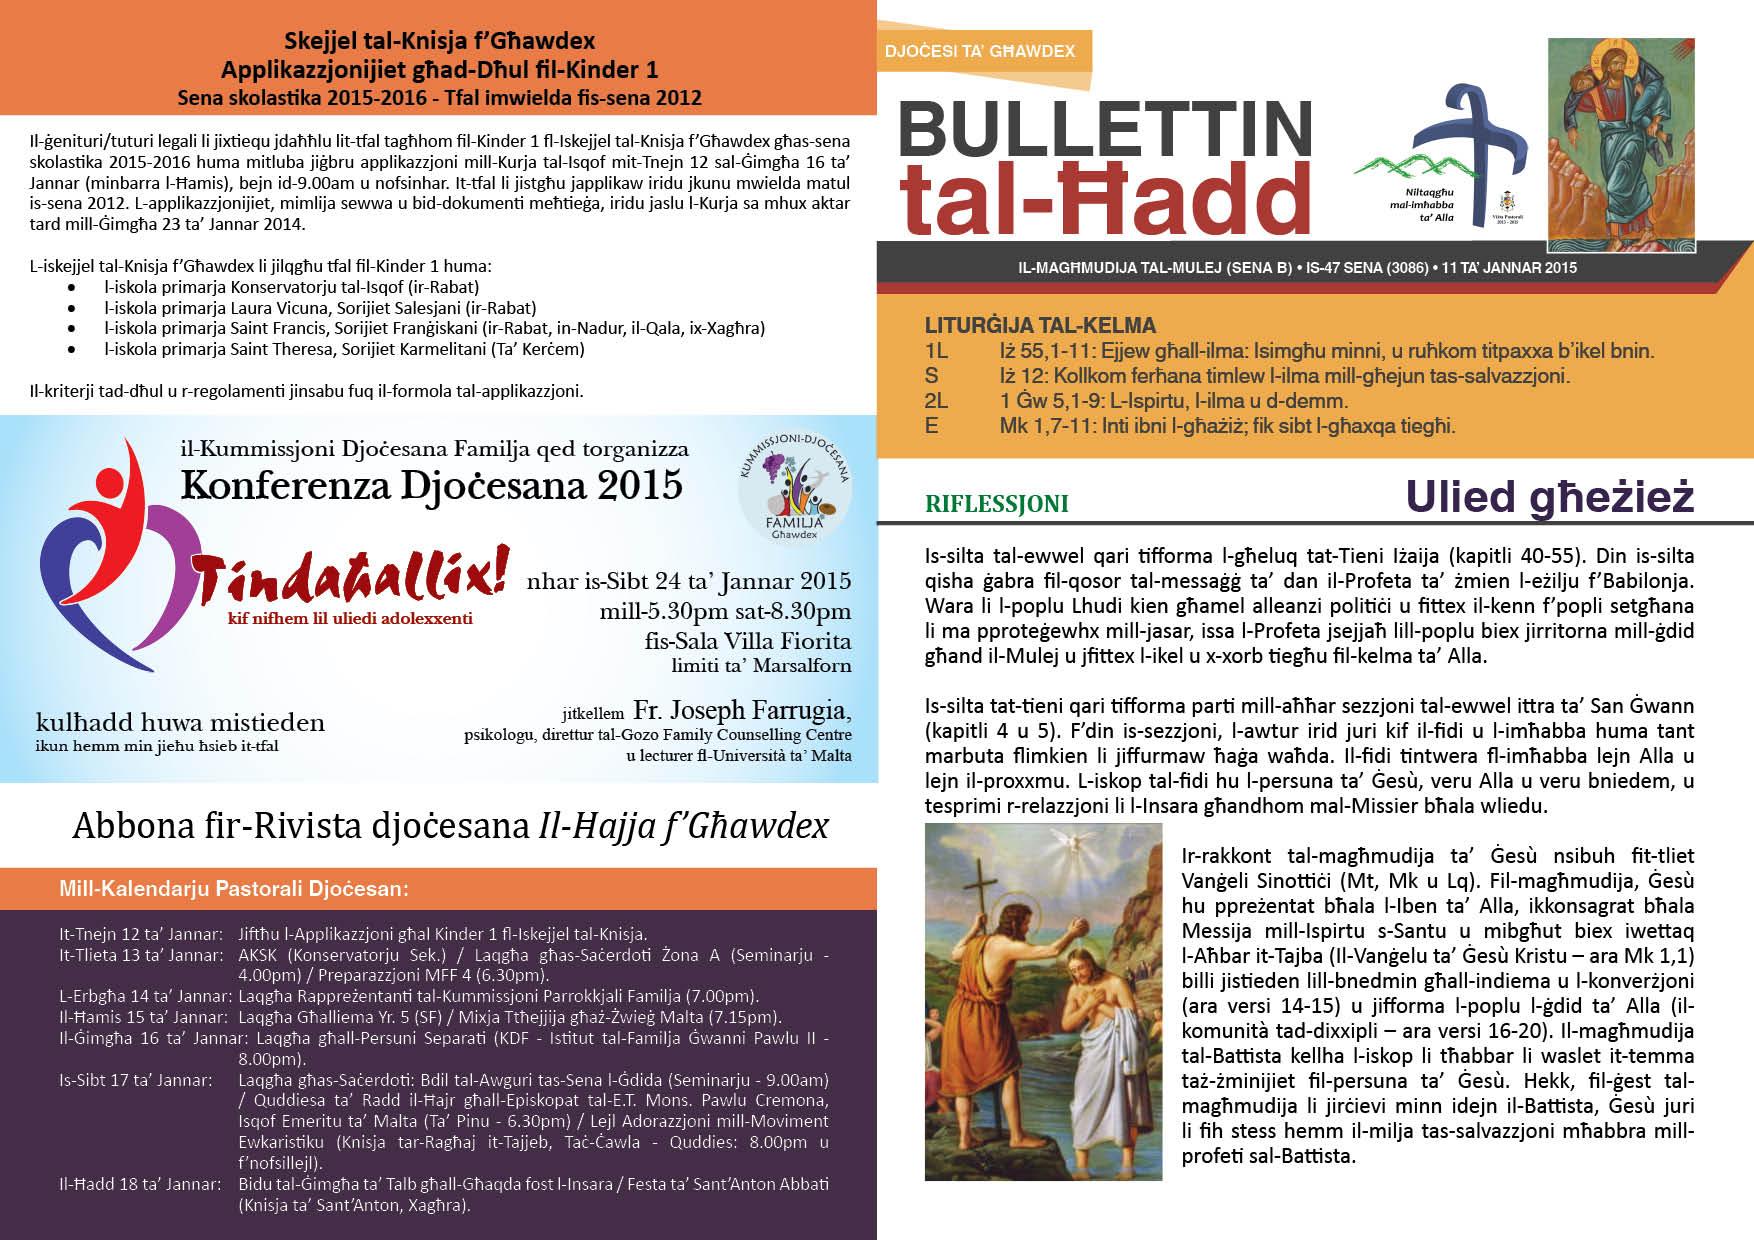 bullettin-2015-jannar-11.jpg